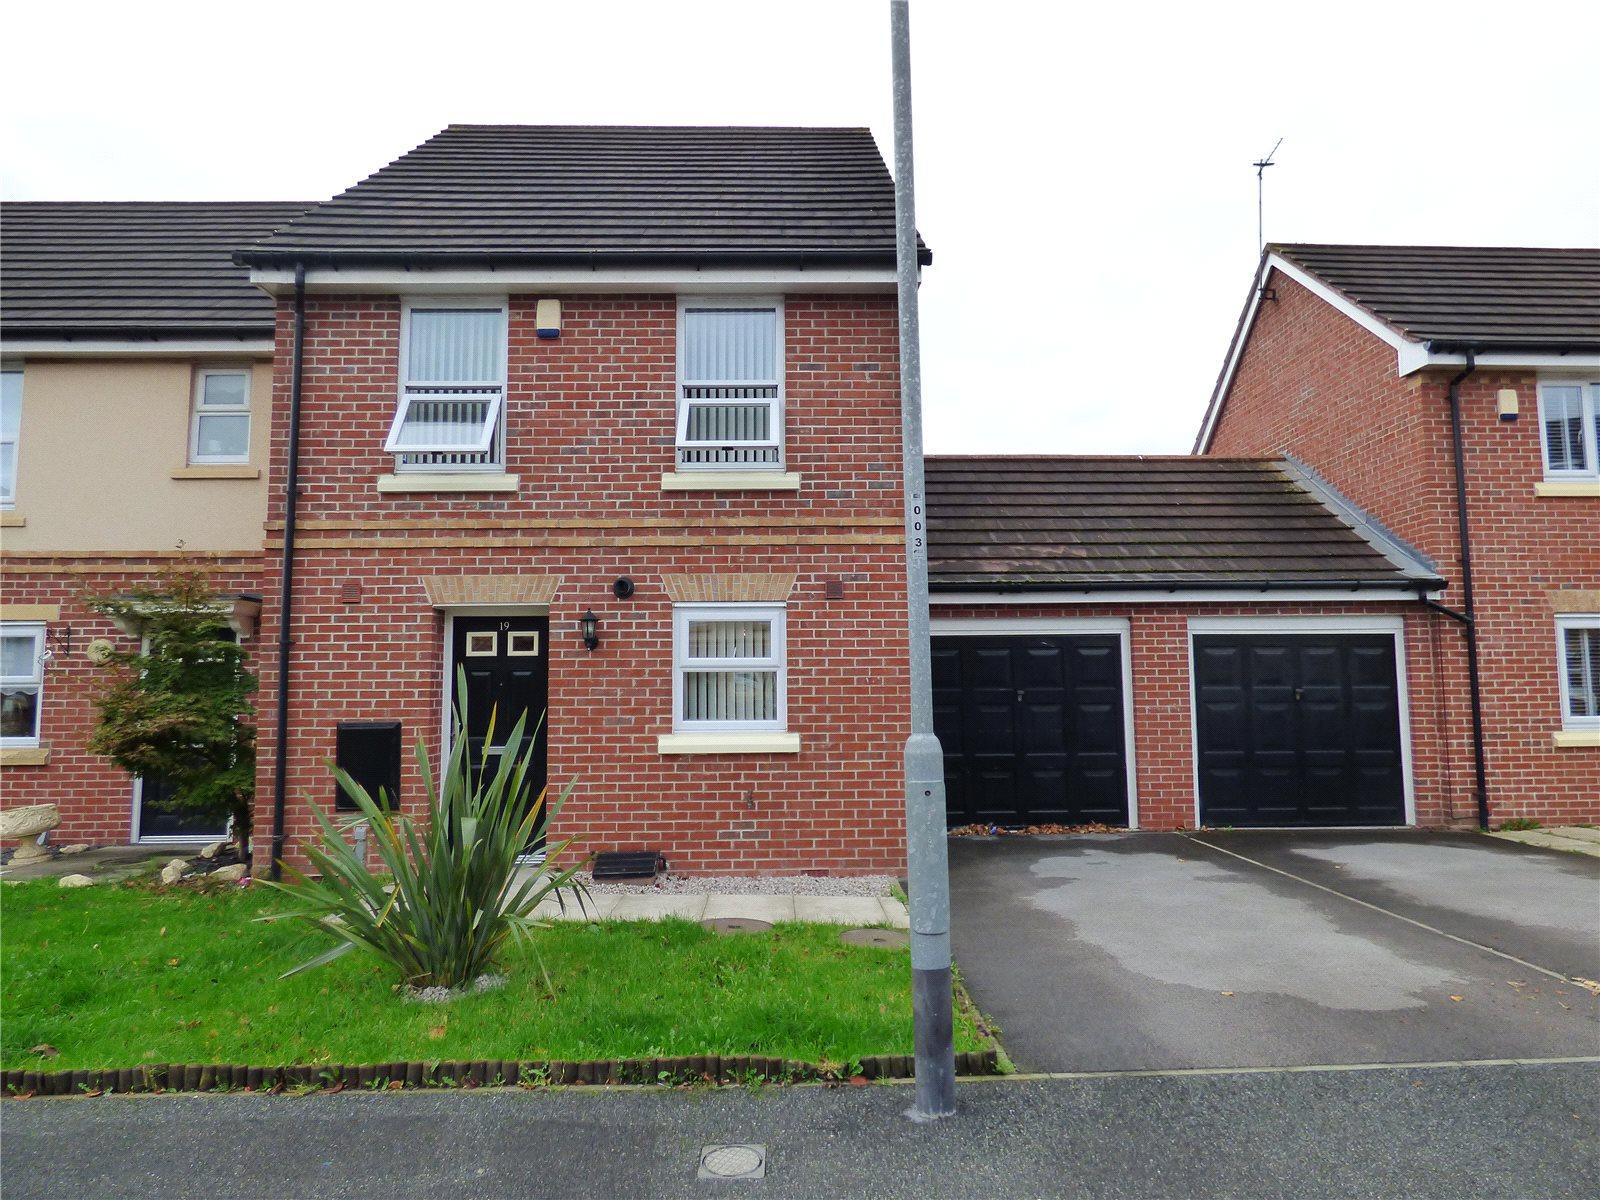 3 Bedrooms Semi Detached House for sale in Berryedge Crescent, Liverpool, Merseyside, L36